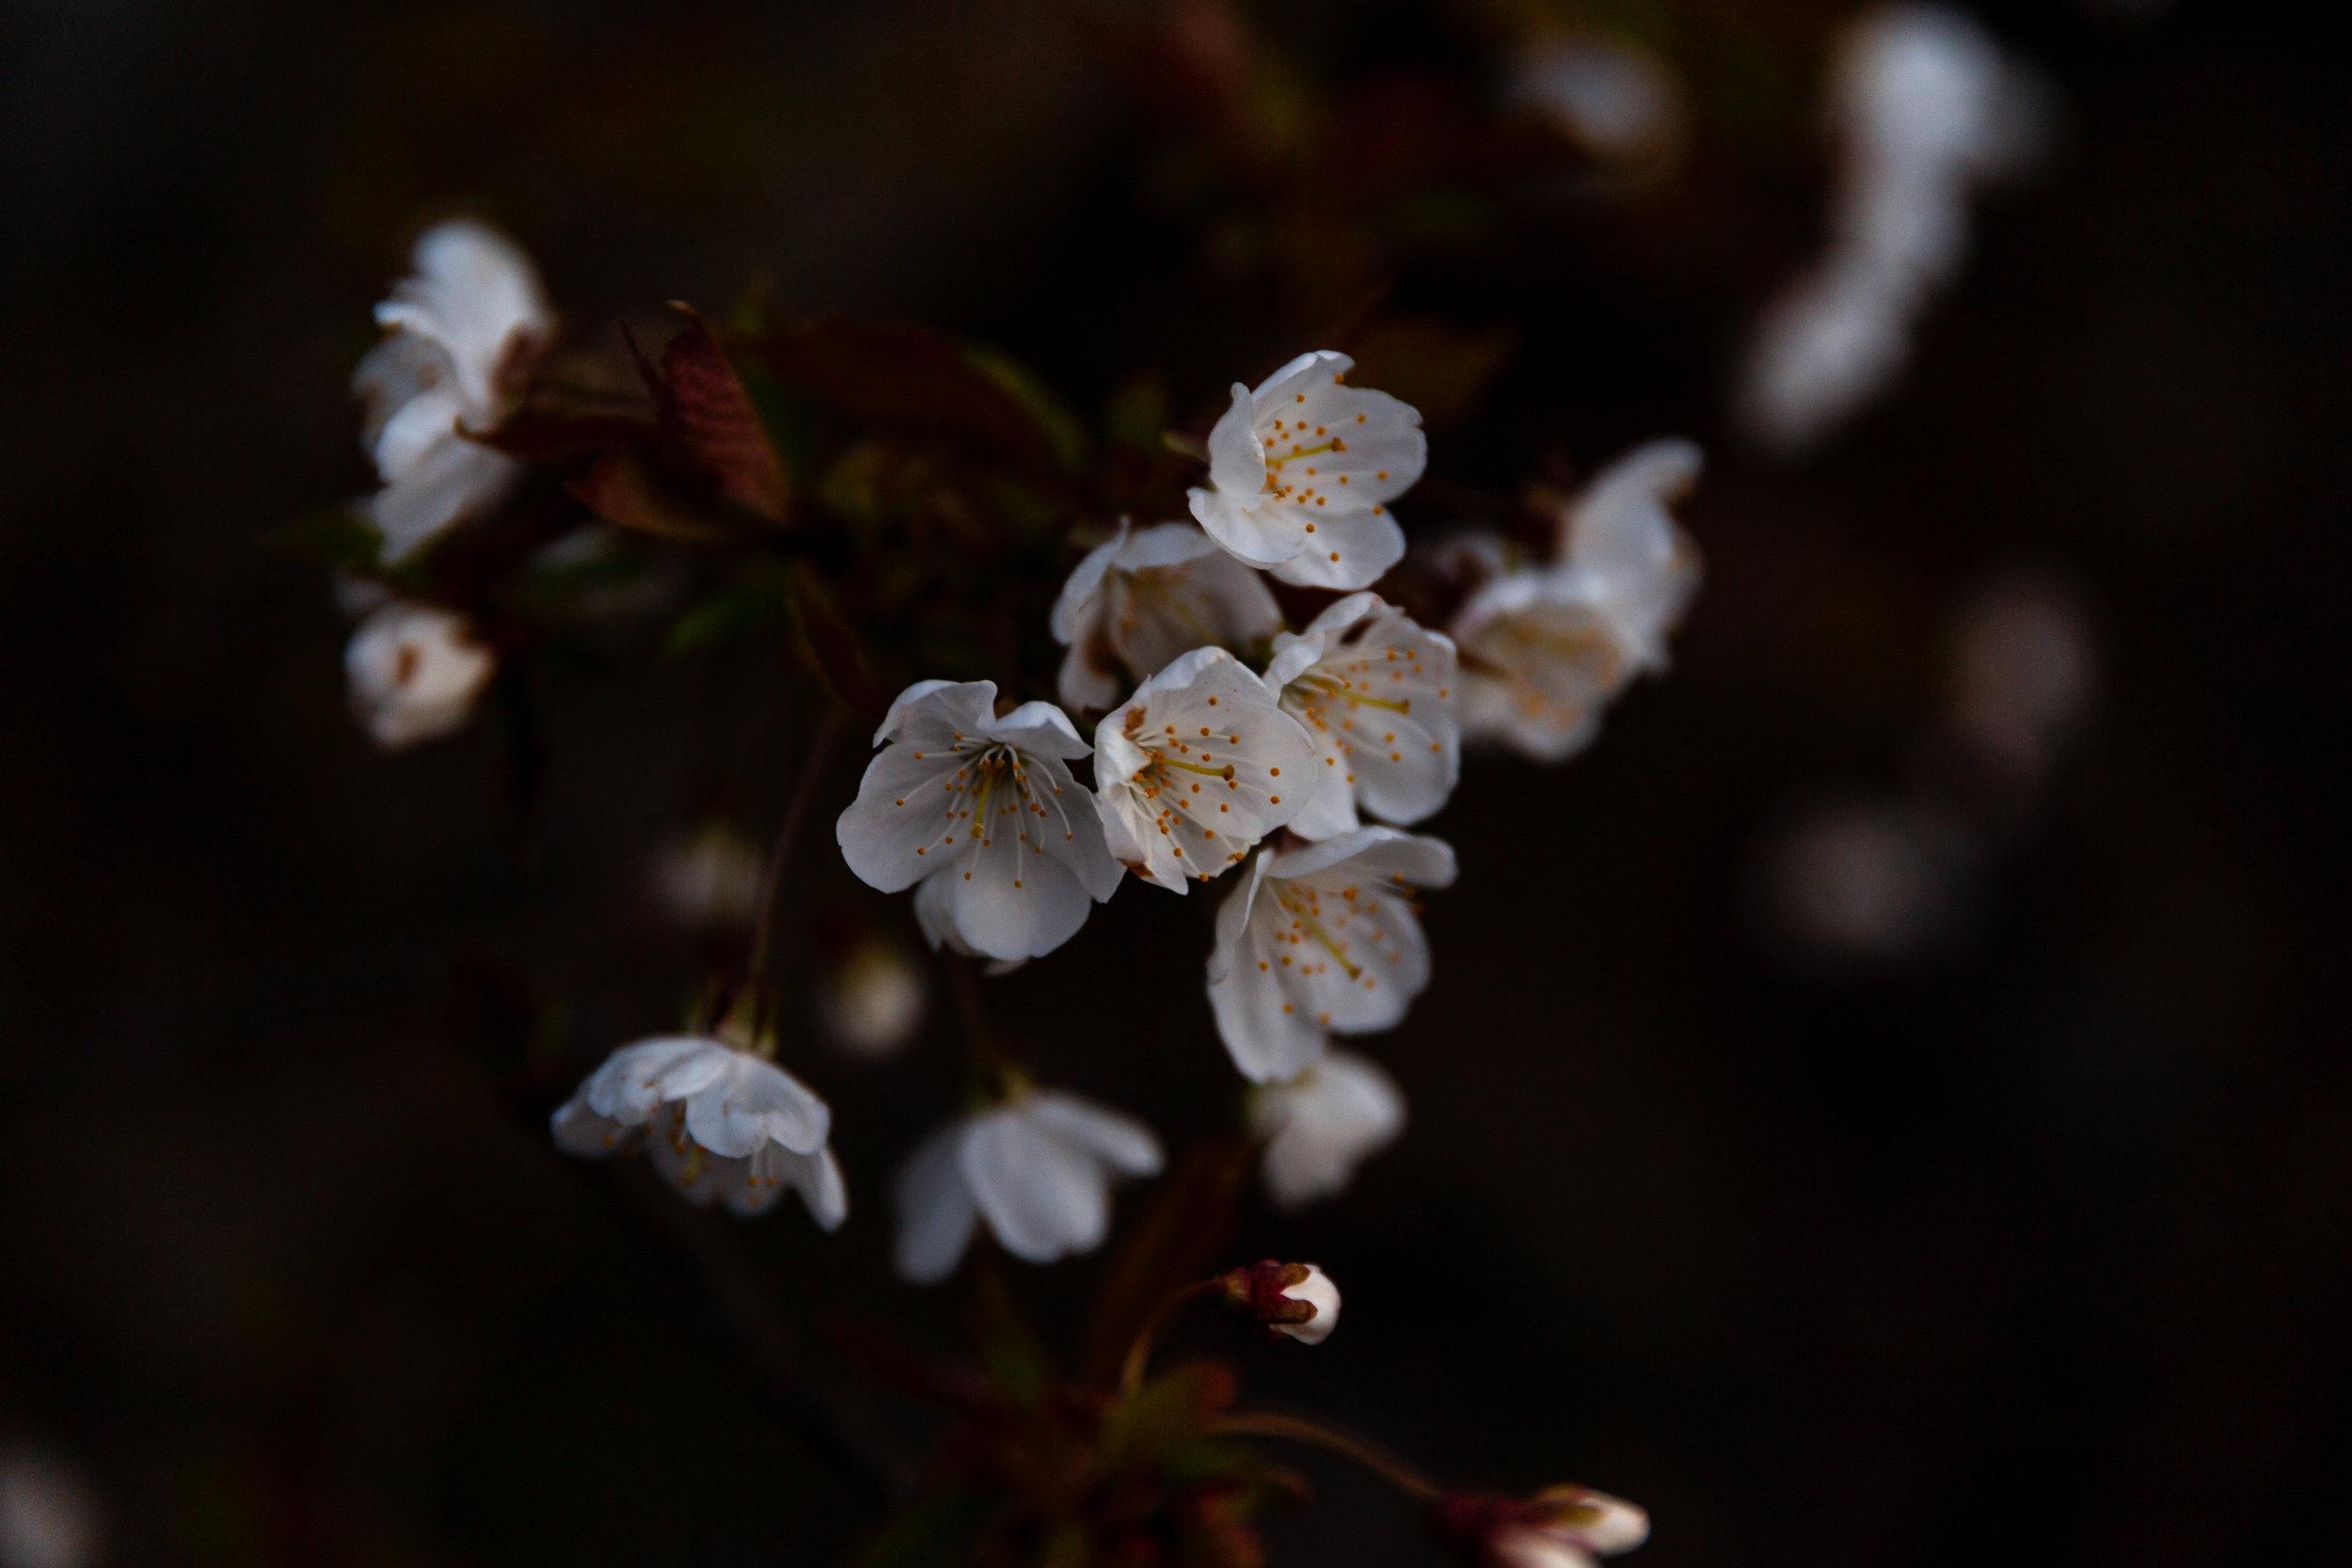 1 flower sunset titlow park april 19 2018 jenny l miller copy.jpg